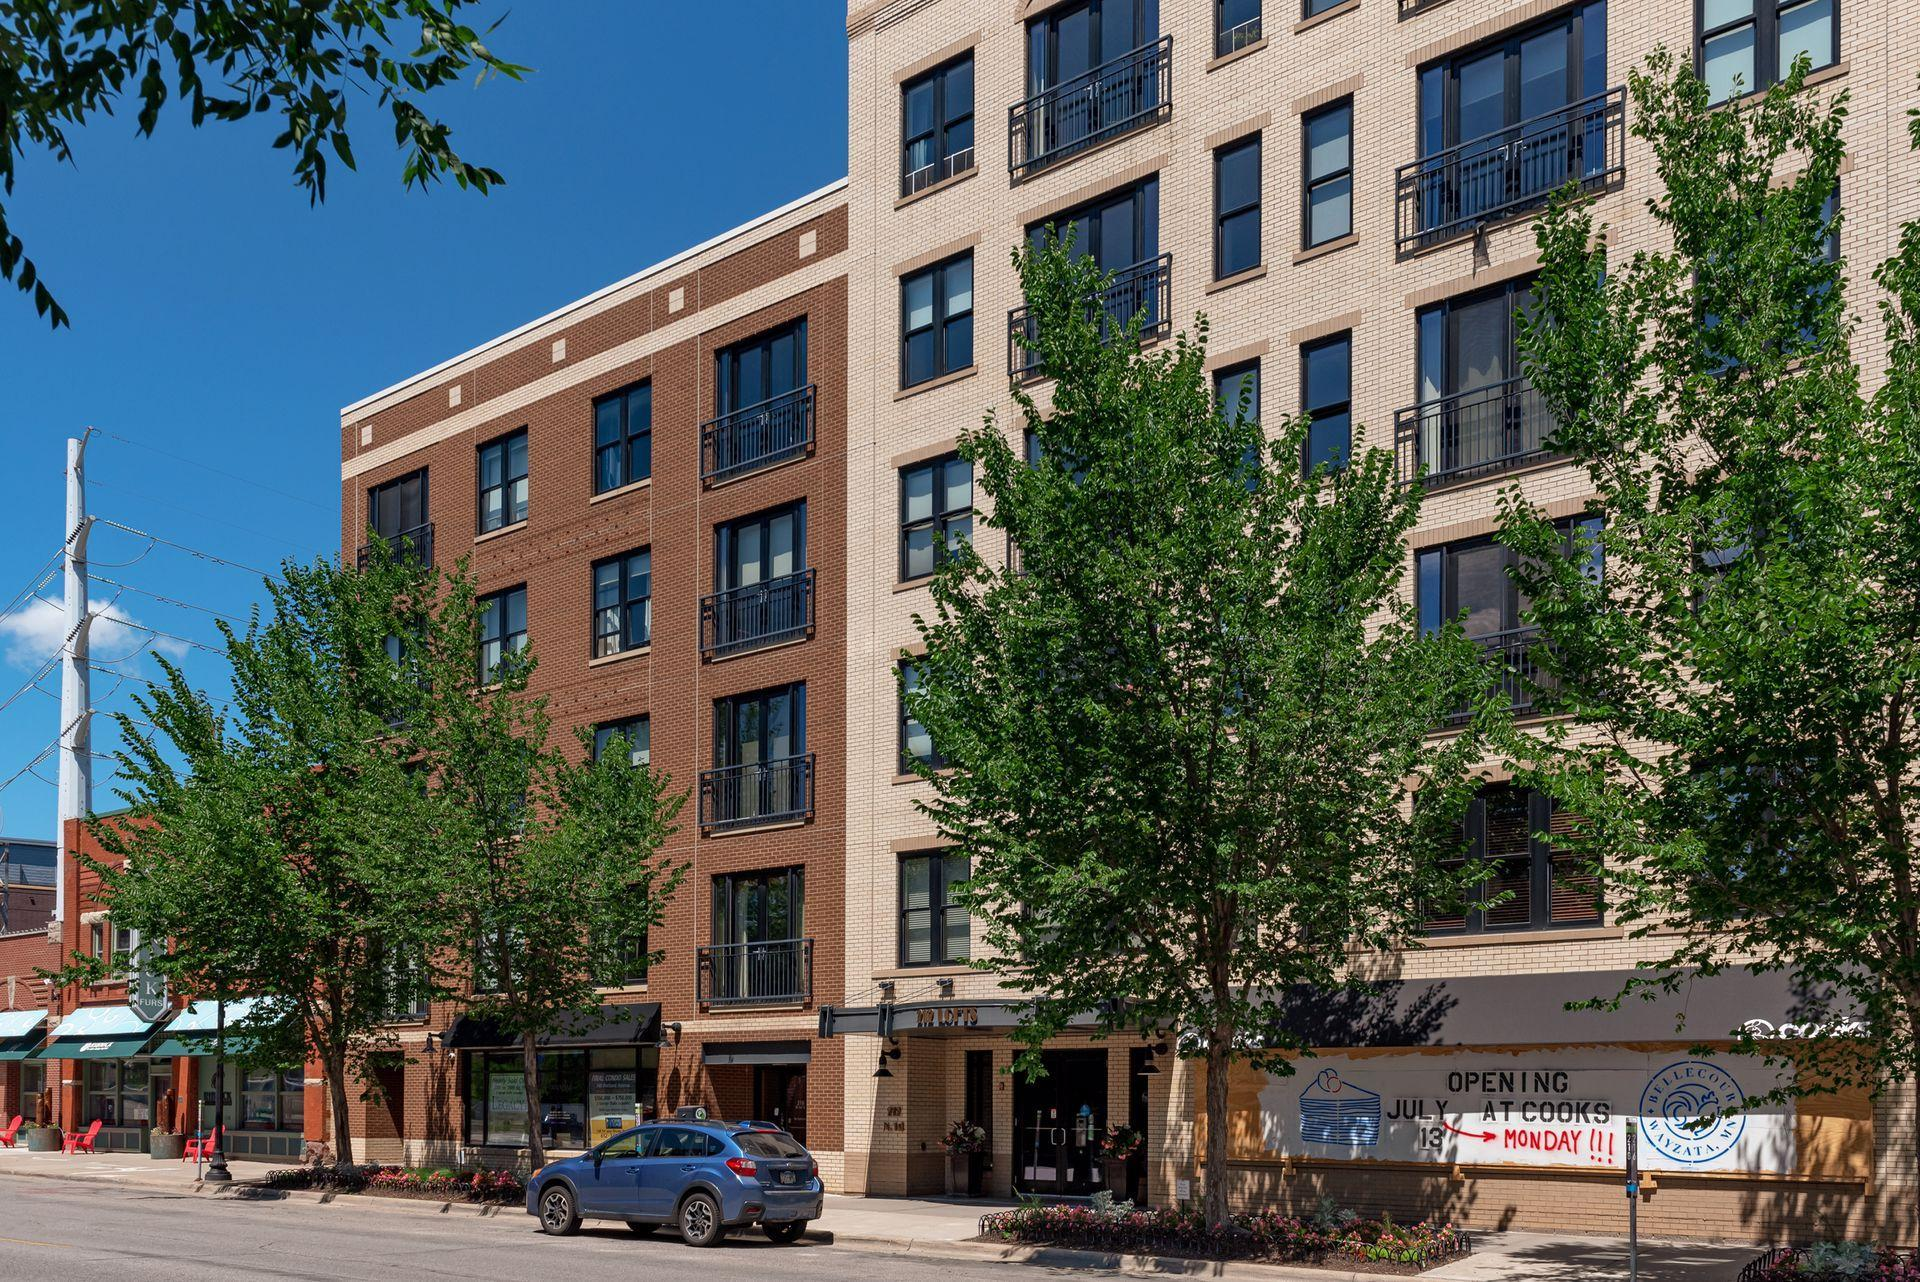 212 1st #212 Property Photo - Minneapolis, MN real estate listing